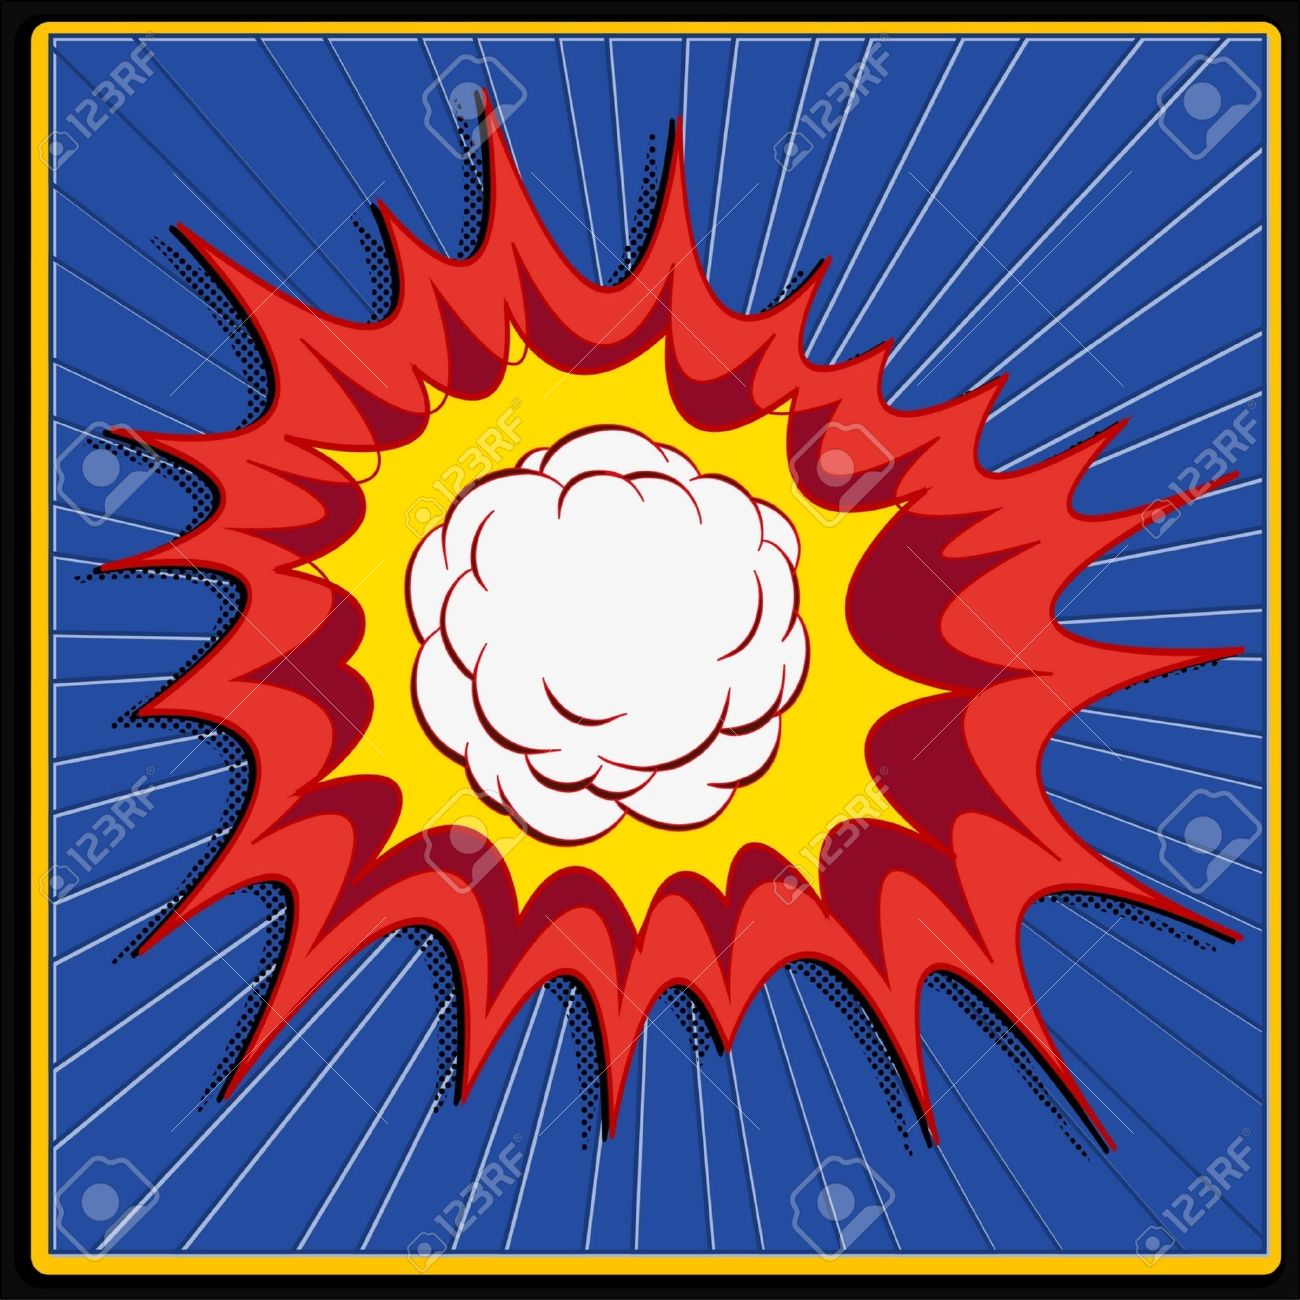 comic book explosion art Stock Vector - 21314825